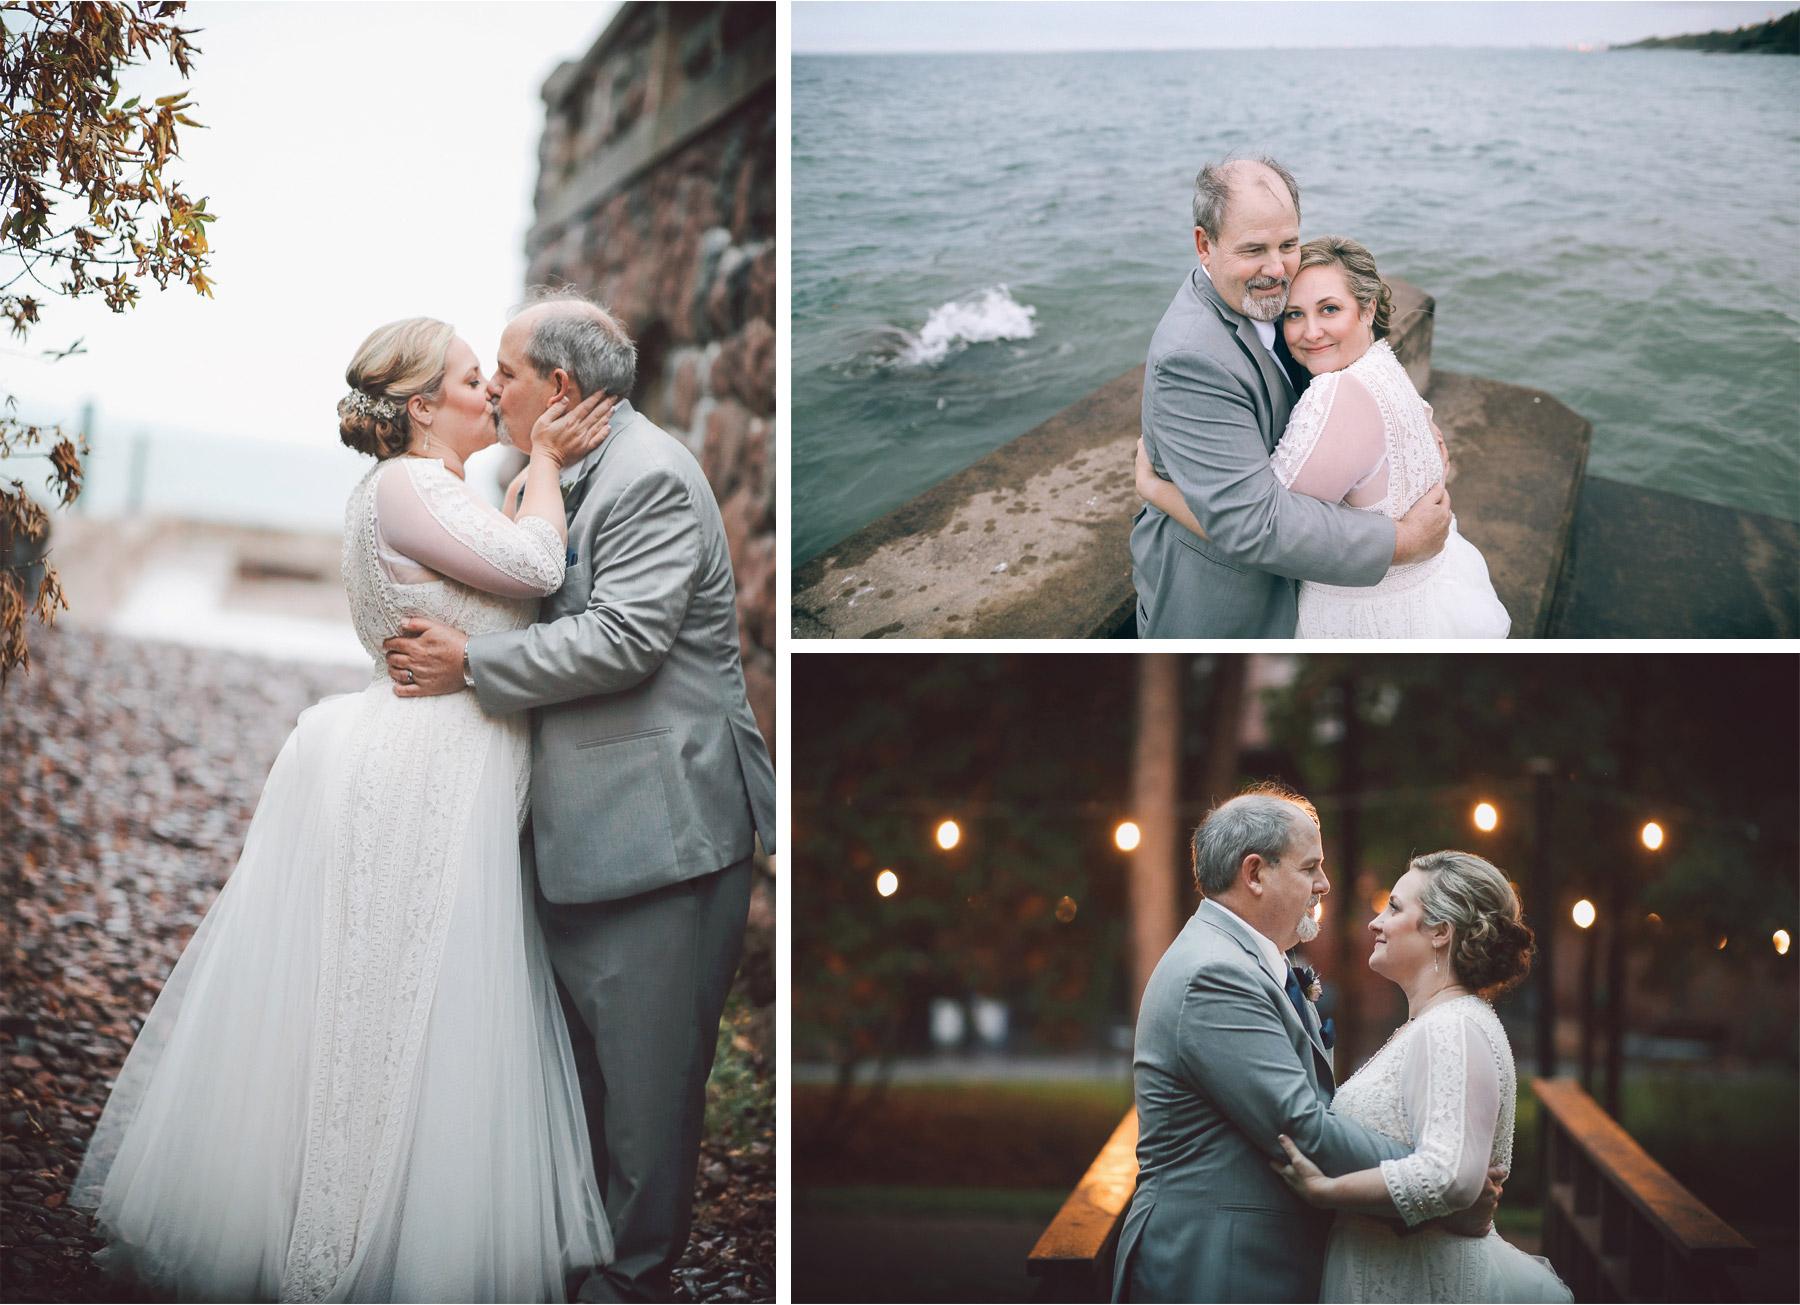 17-Duluth-Minnesota-Wedding-Photography-by-Vick-Photography-Glensheen-Mansion-Rain-Lake-Superior-Kelli-and-Marc.jpg